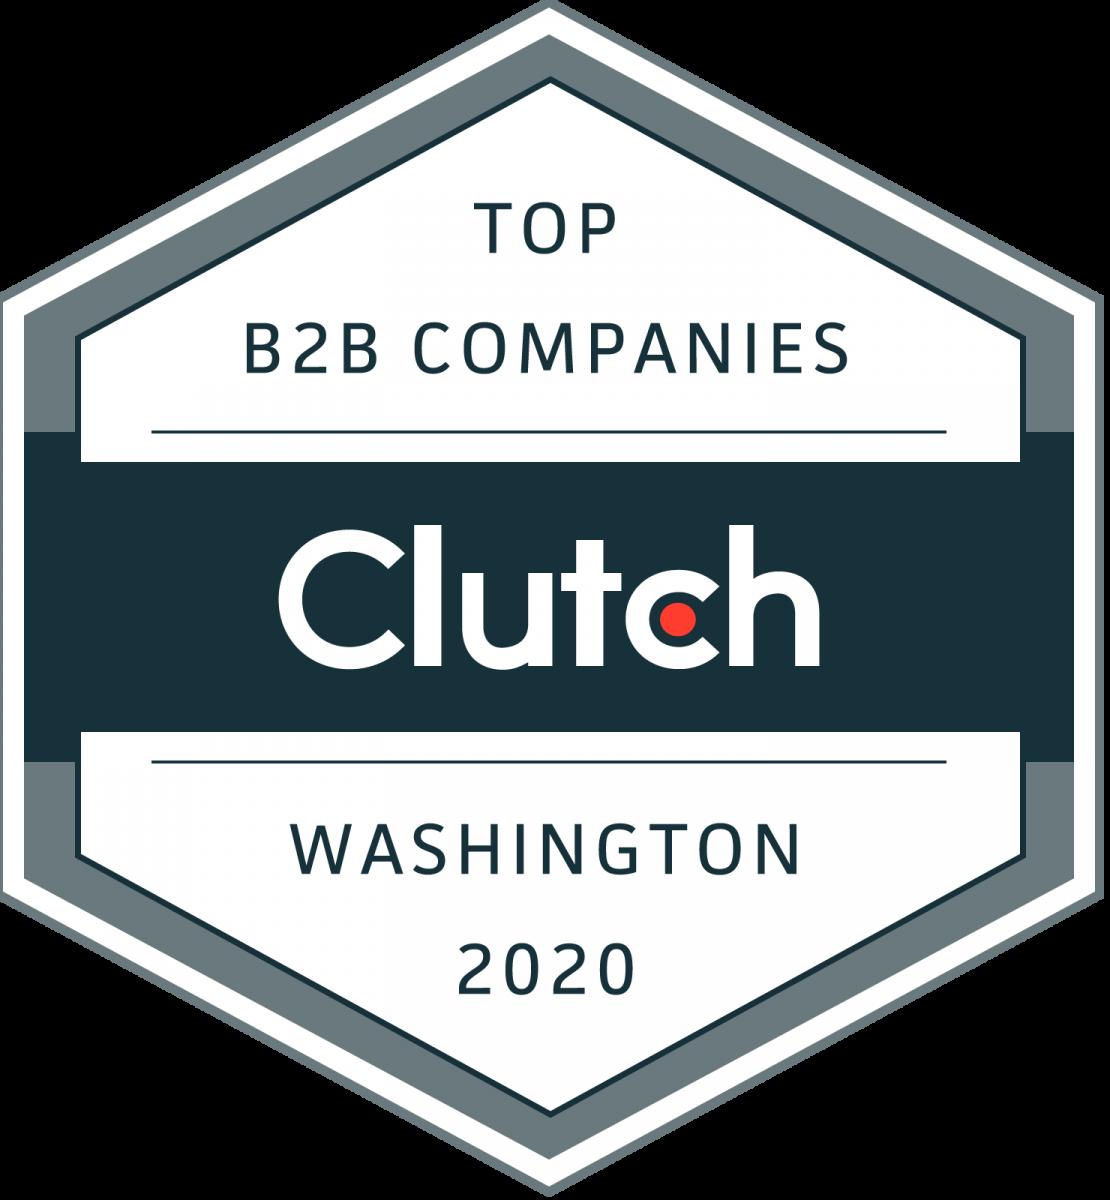 Top Washington B2B Companies